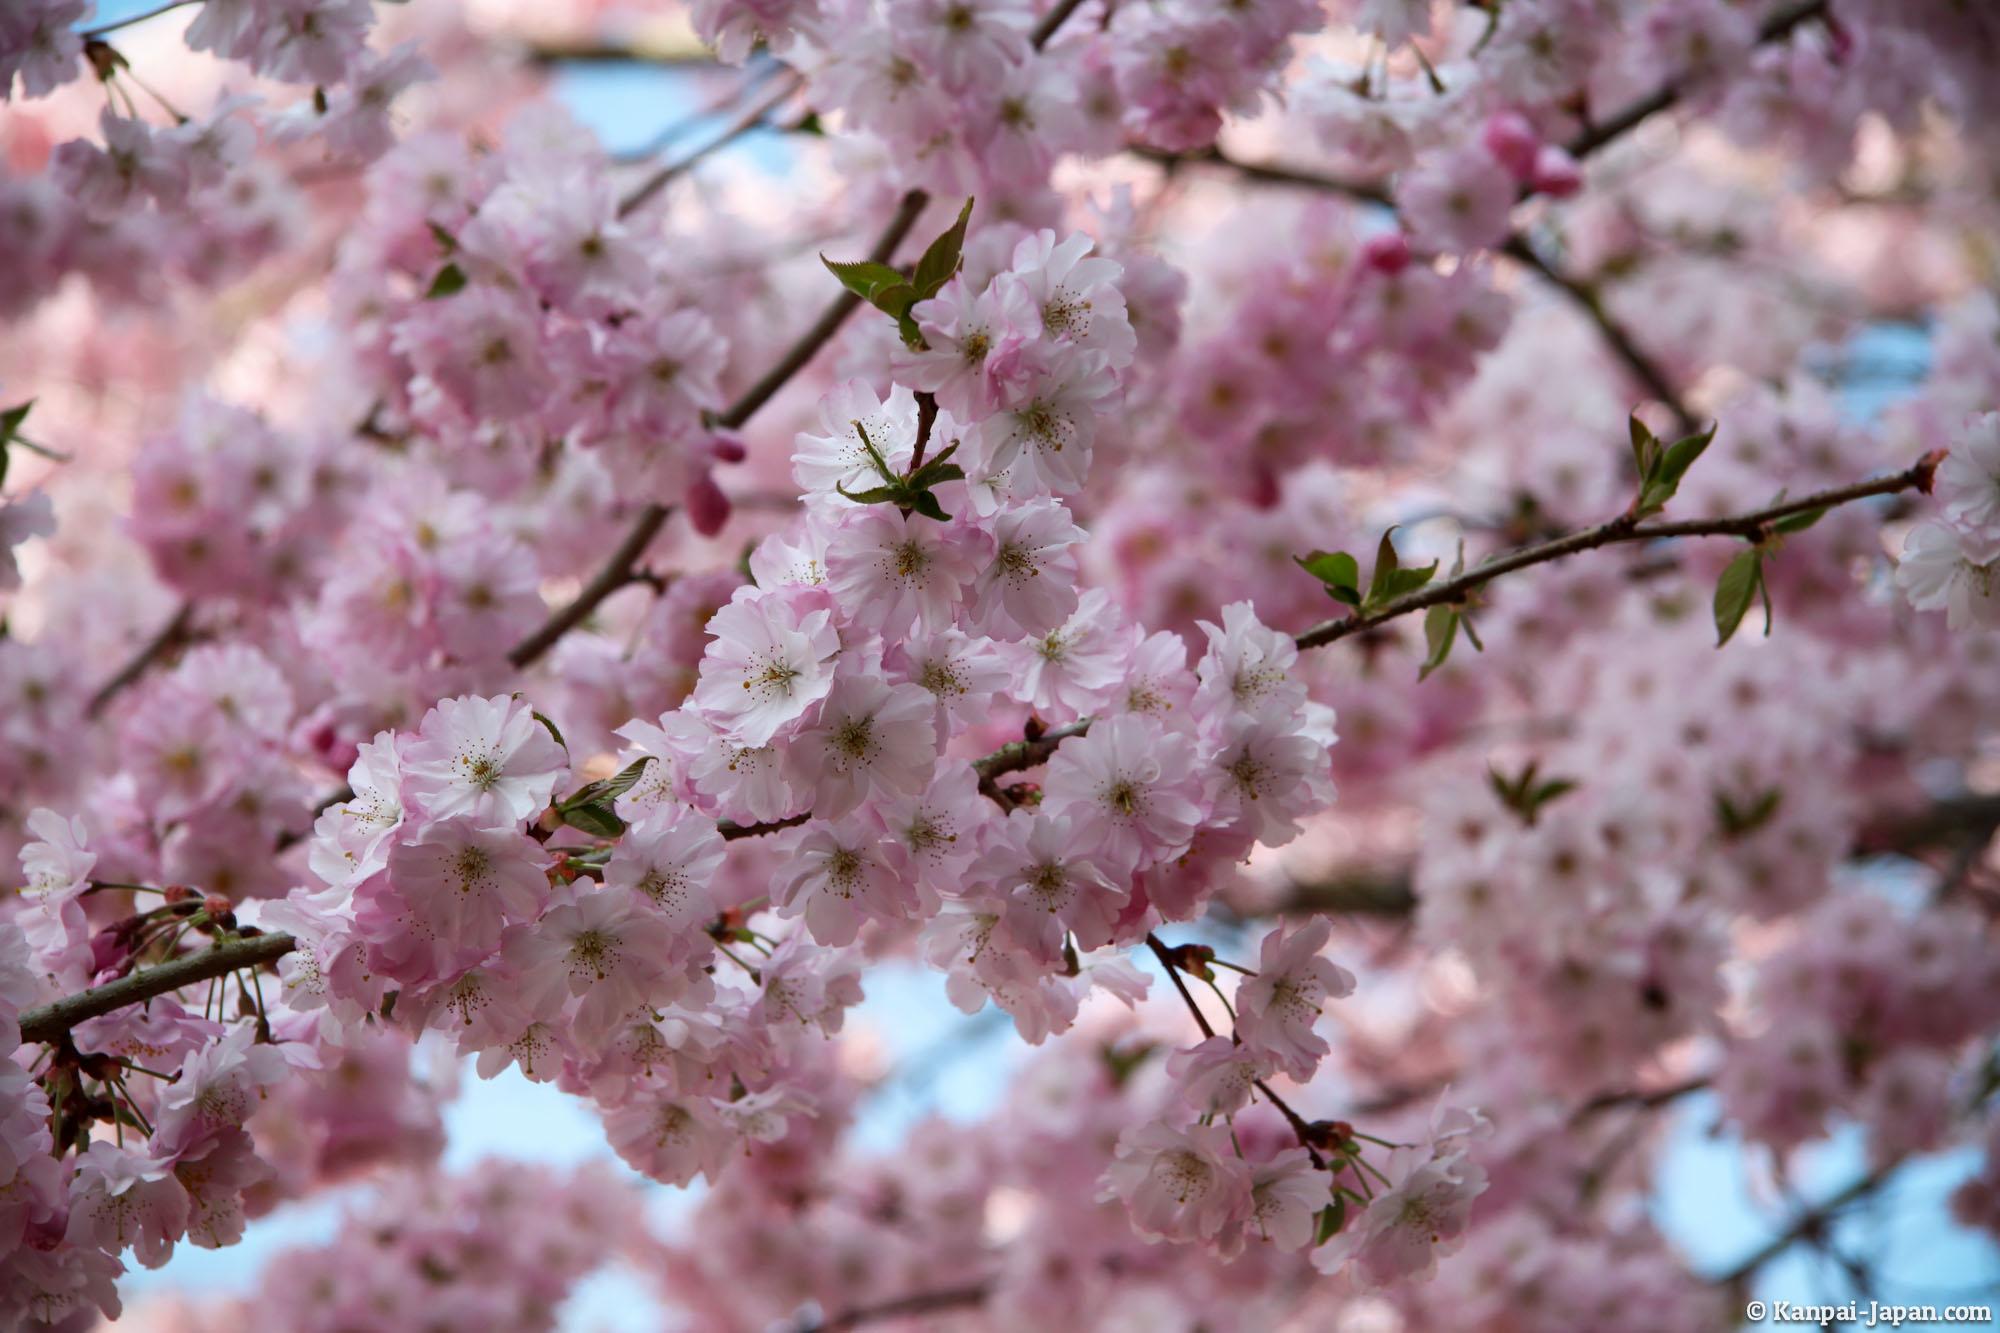 Sakura Ohanami - Japanese Cherry Blossom